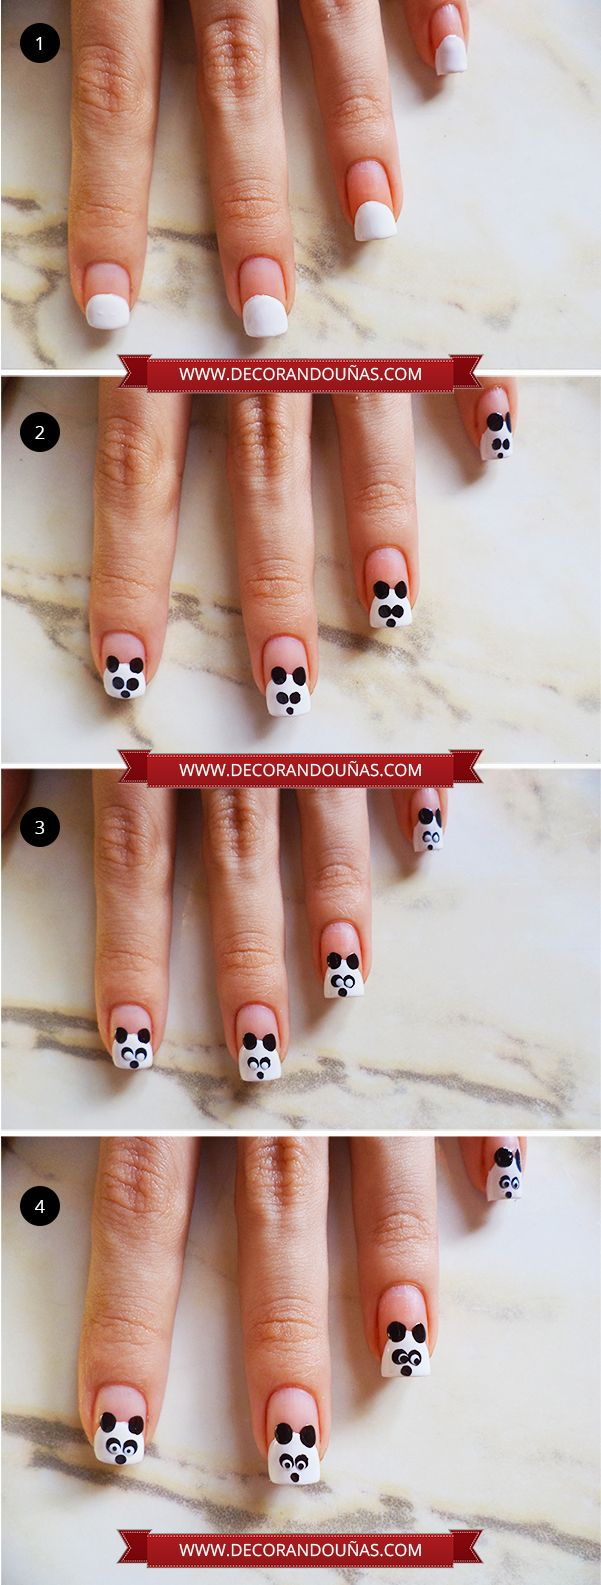 Uñas pintadas con un hermoso oso panda – Paso a paso | Decoración de Uñas - Manicura y NailArt